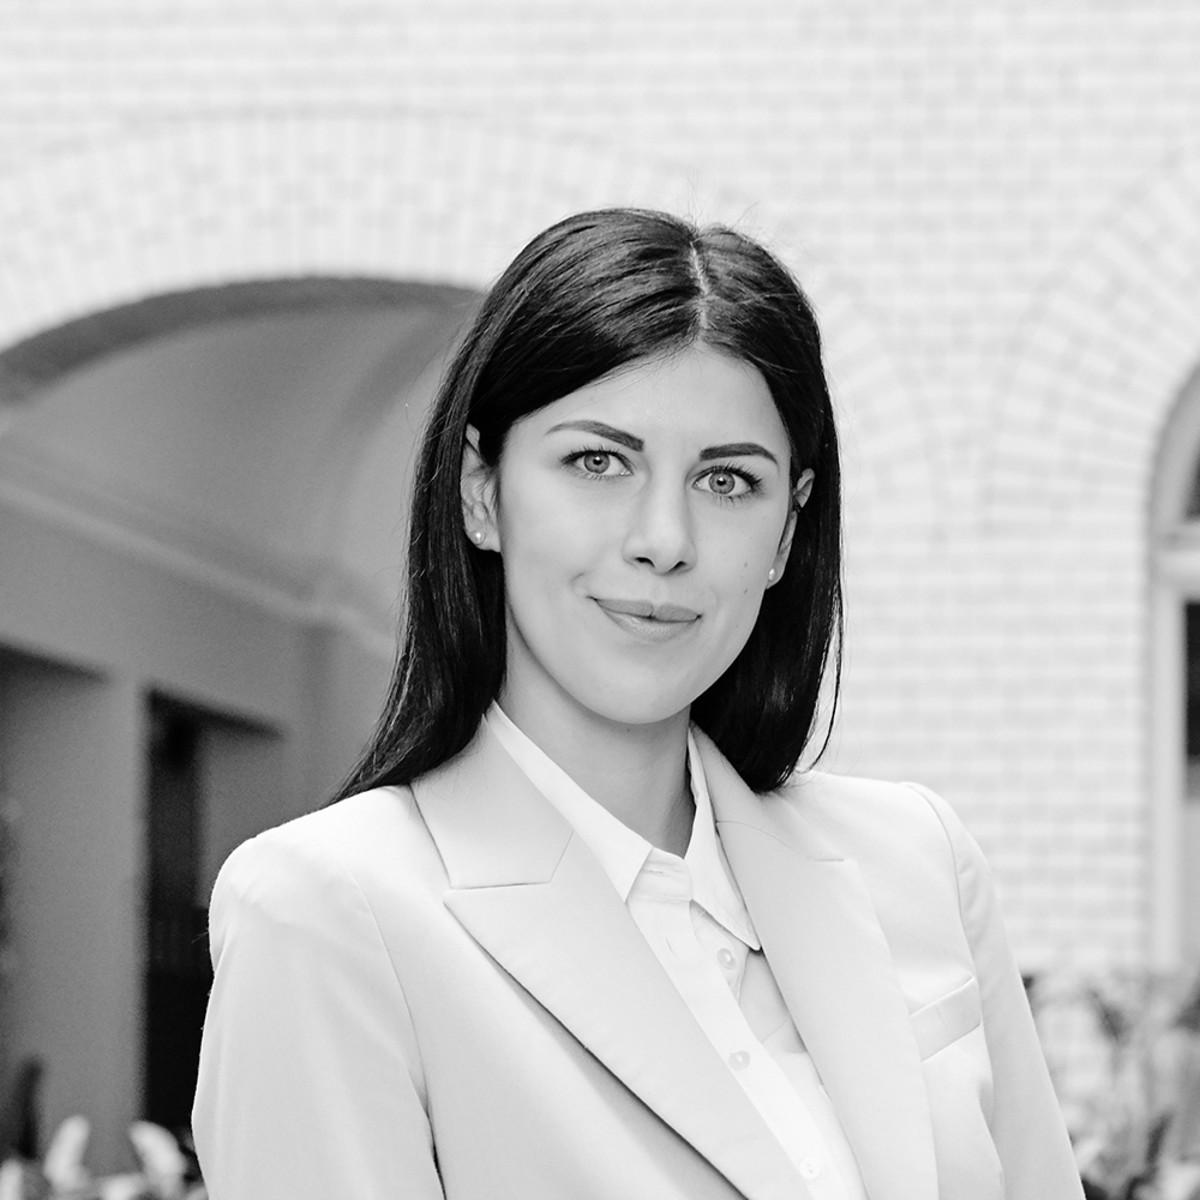 Amanda Pamela Nopens